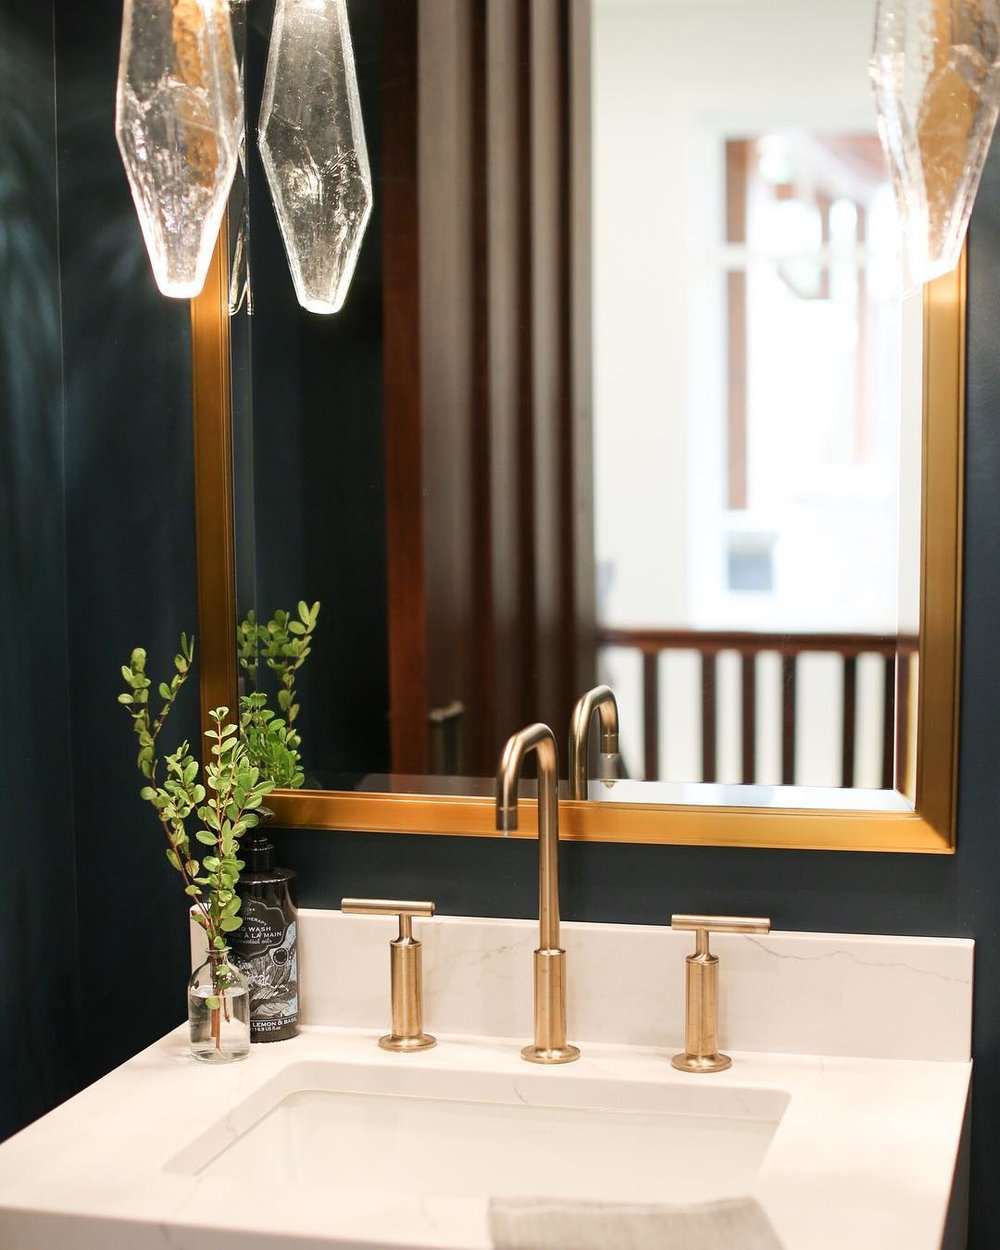 Photo courtesy of Valerie Anderson Interior Design